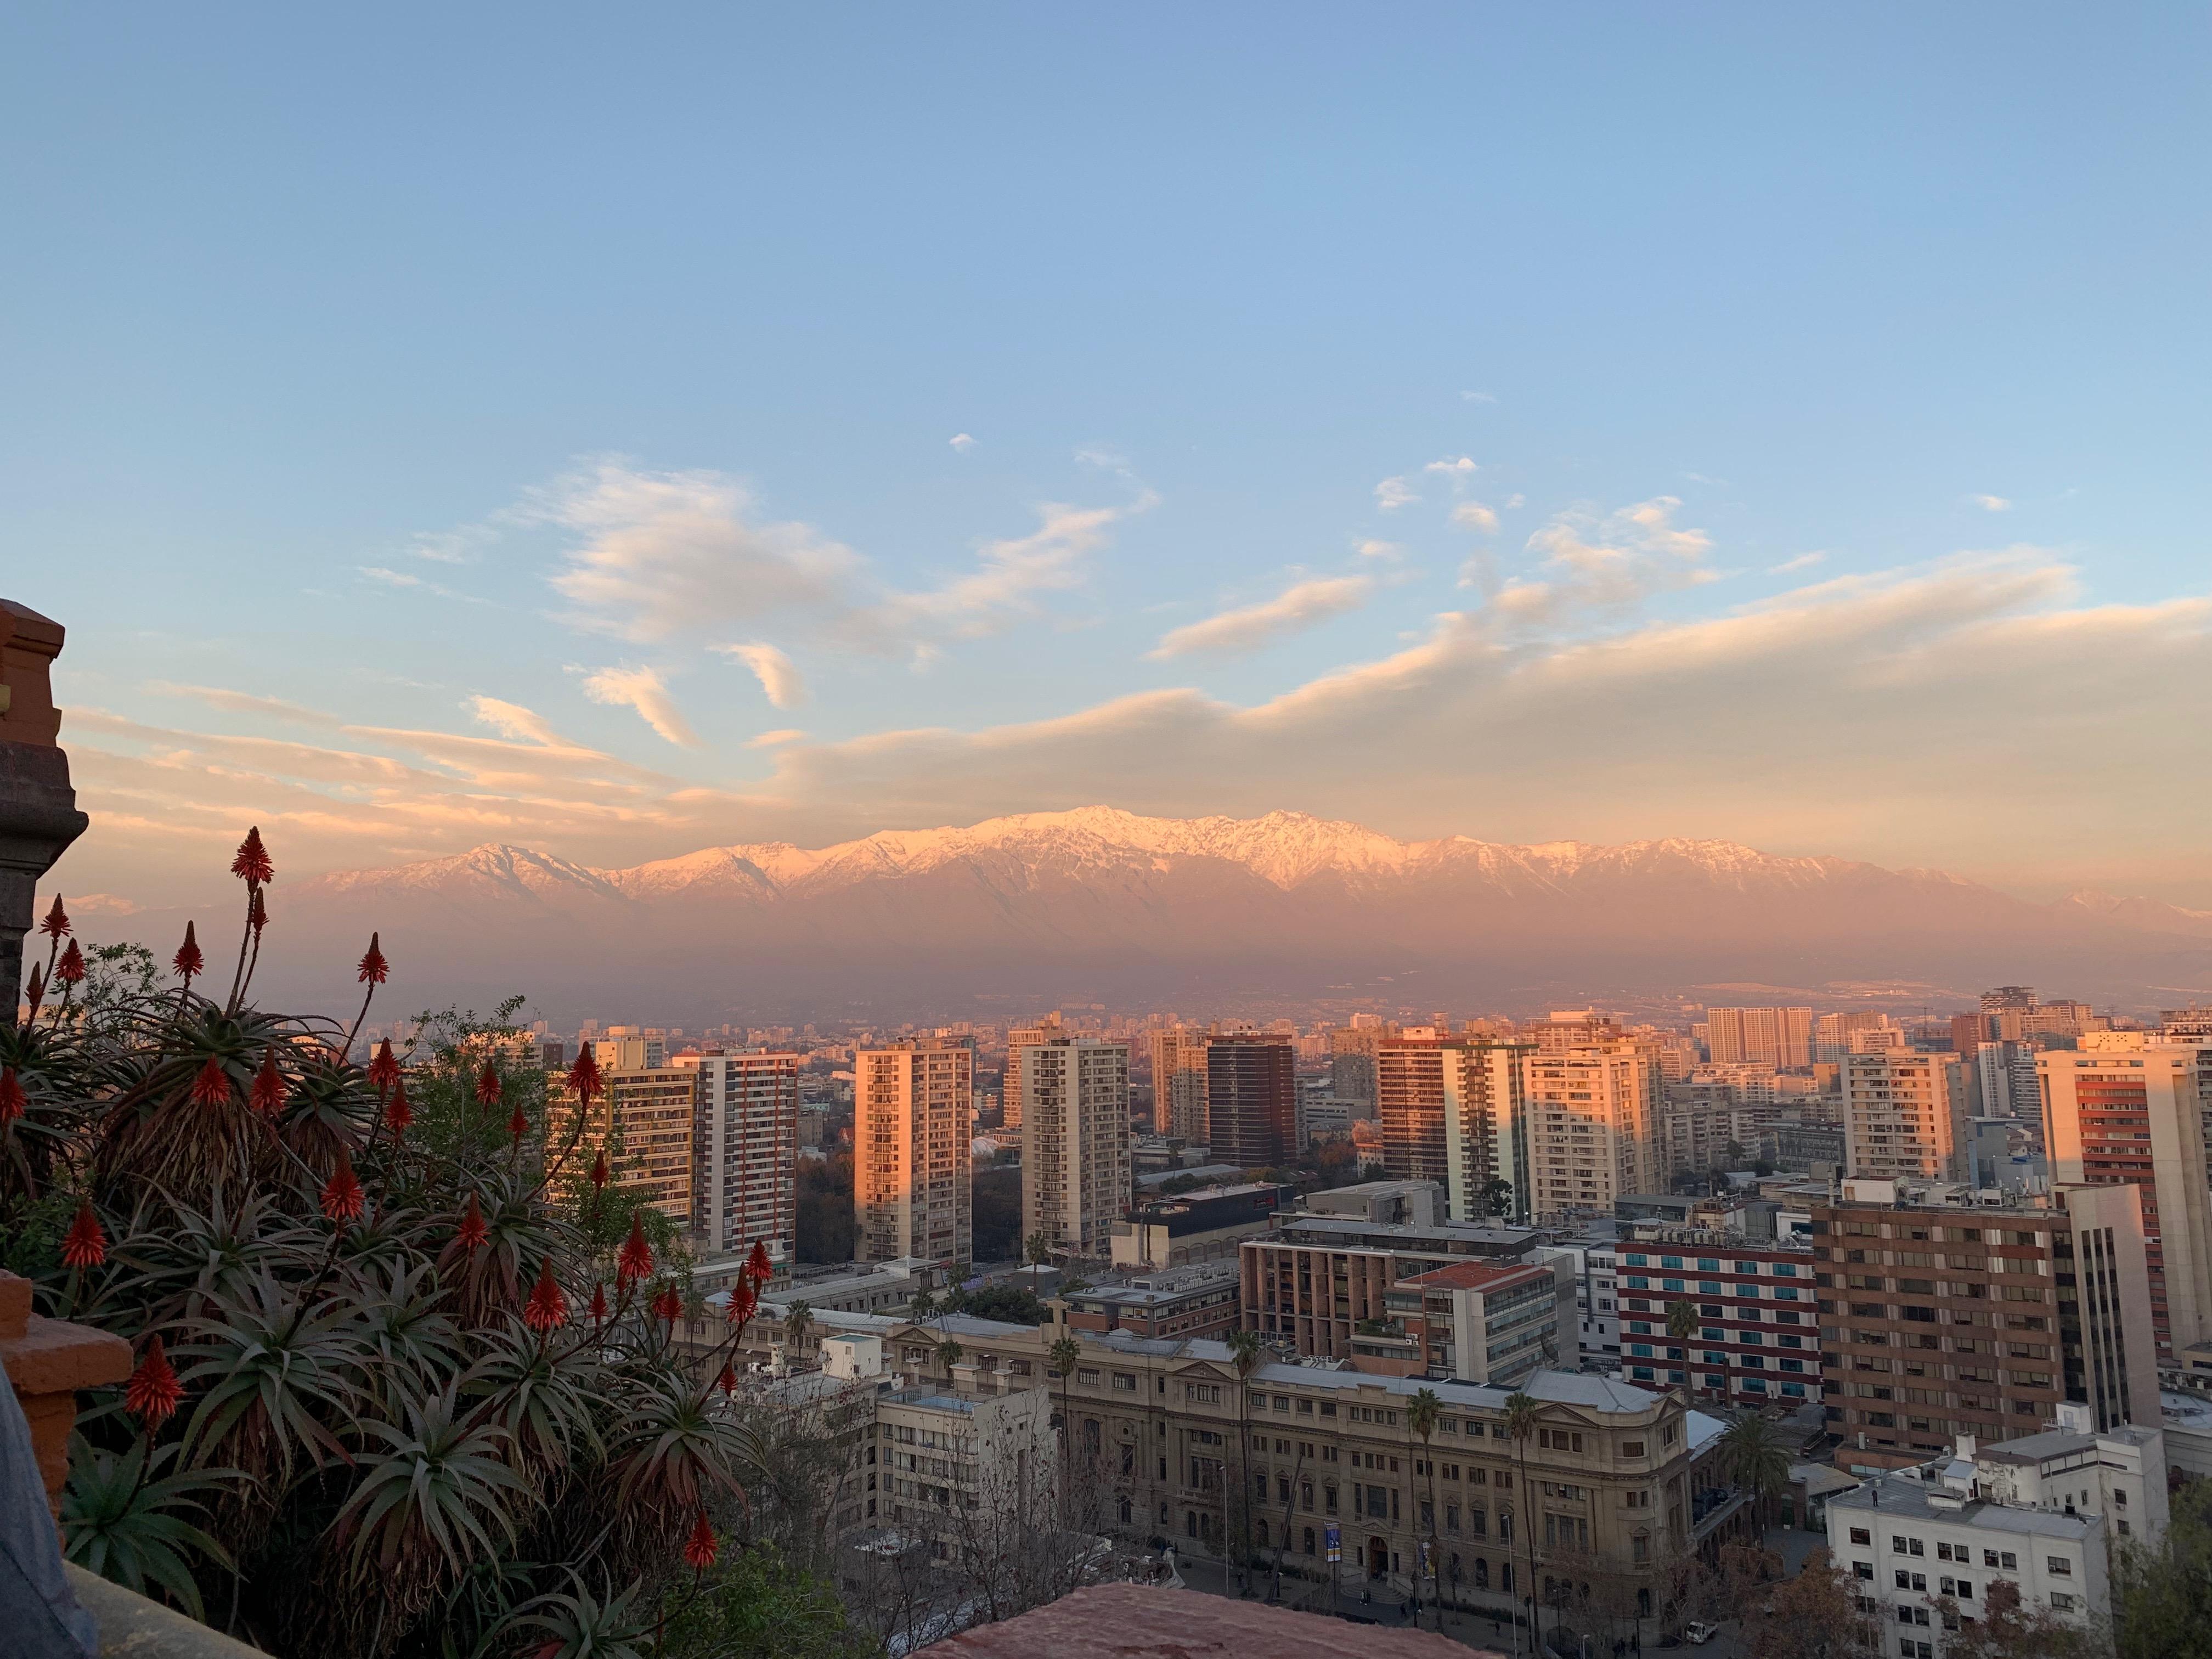 http://meineko.sakura.ne.jp/Chile/Chile-8-Santiago.JPG